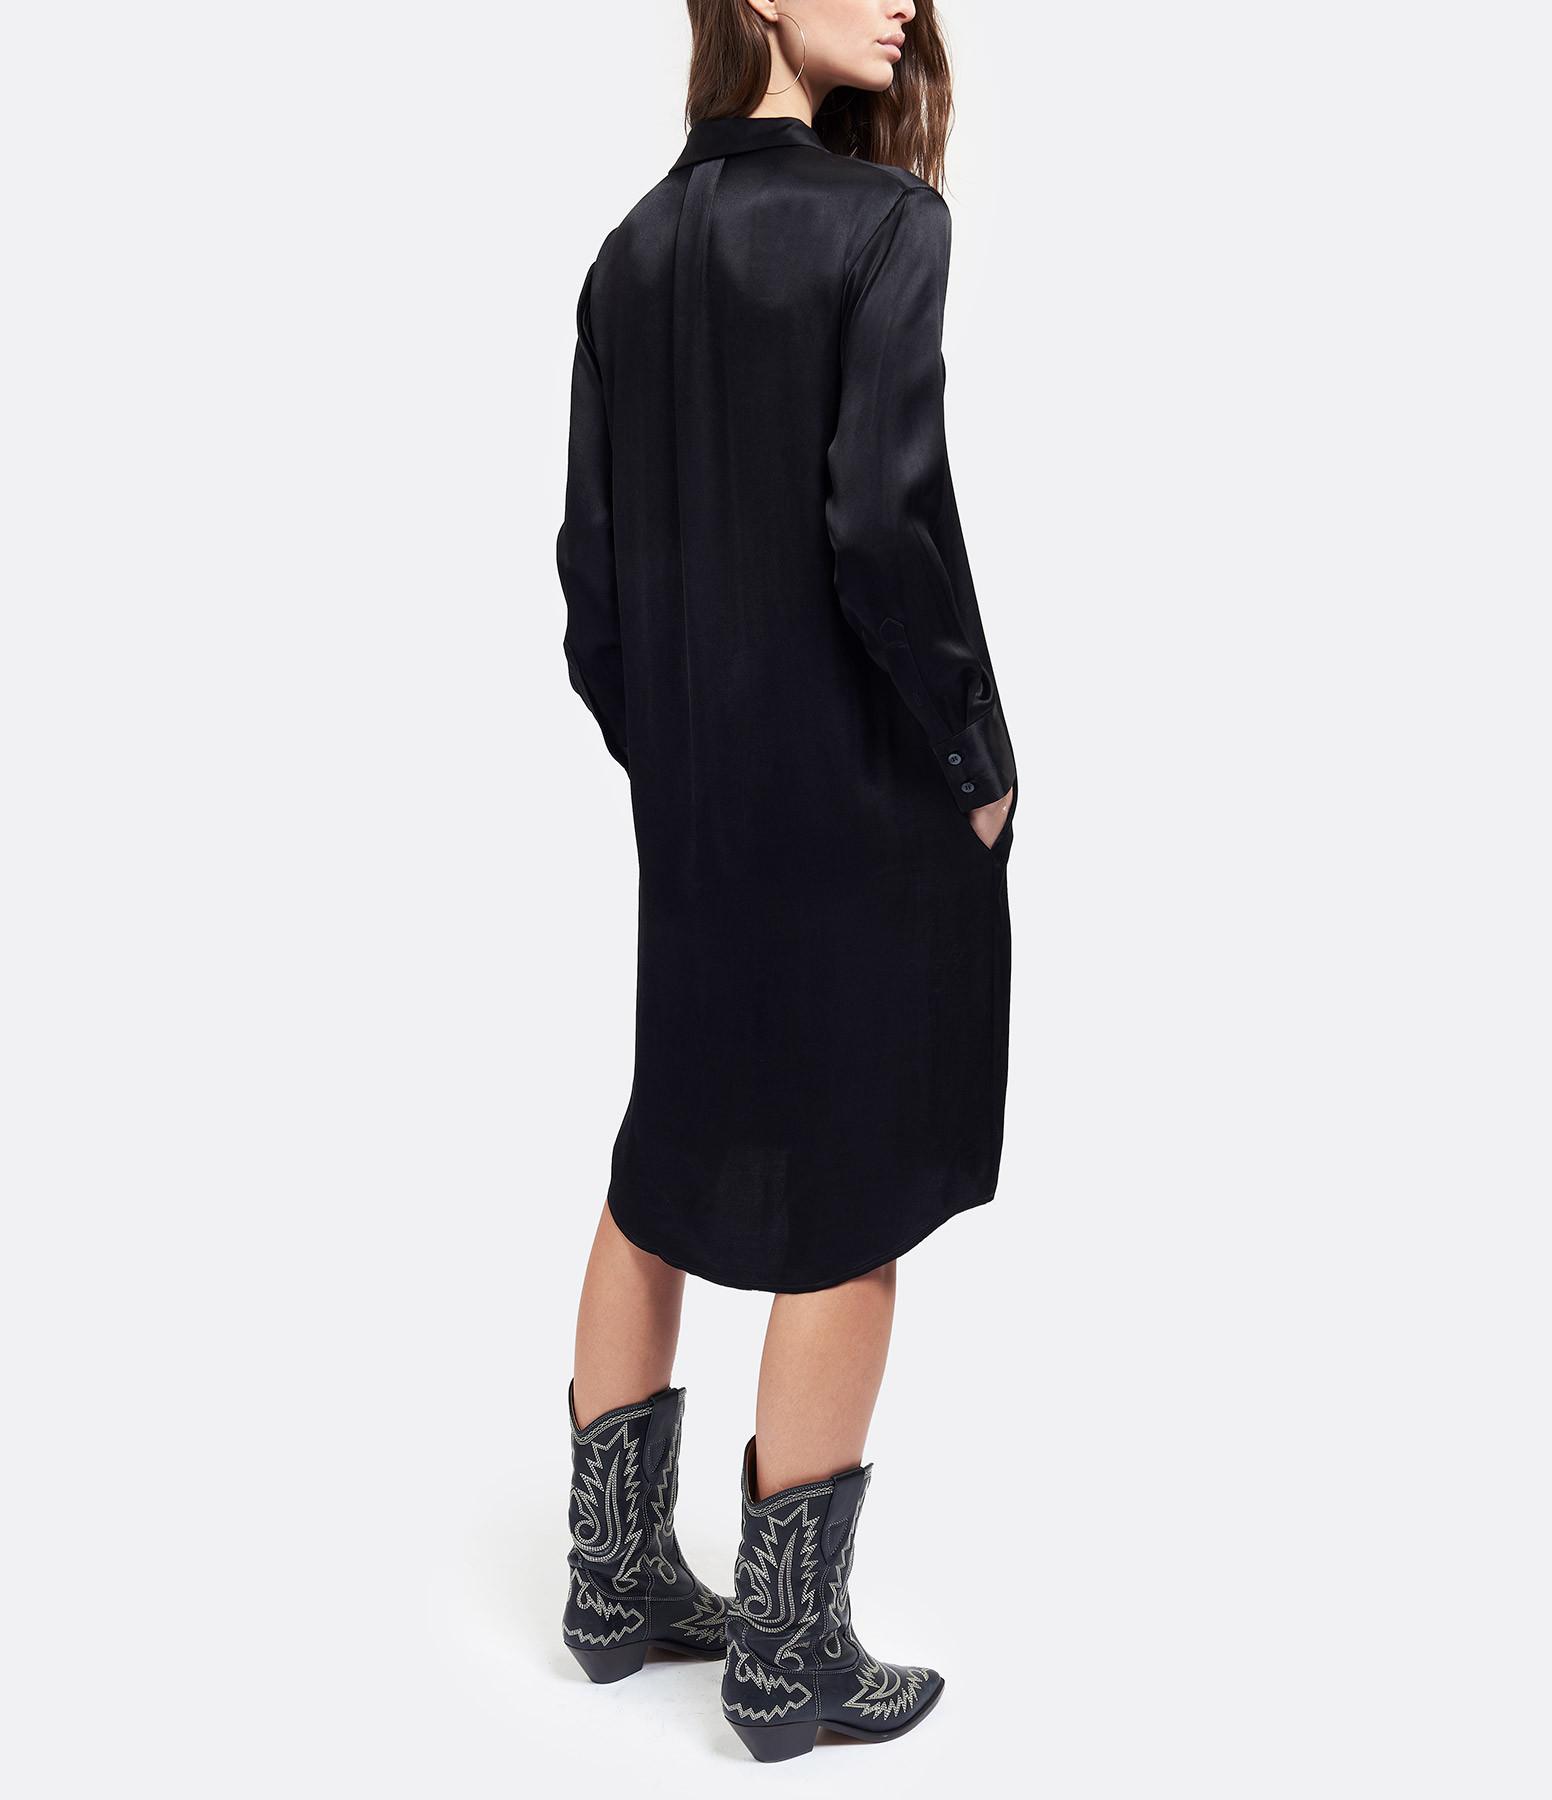 JEANNE VOULAND - Robe Chemise Cass Satin Noir